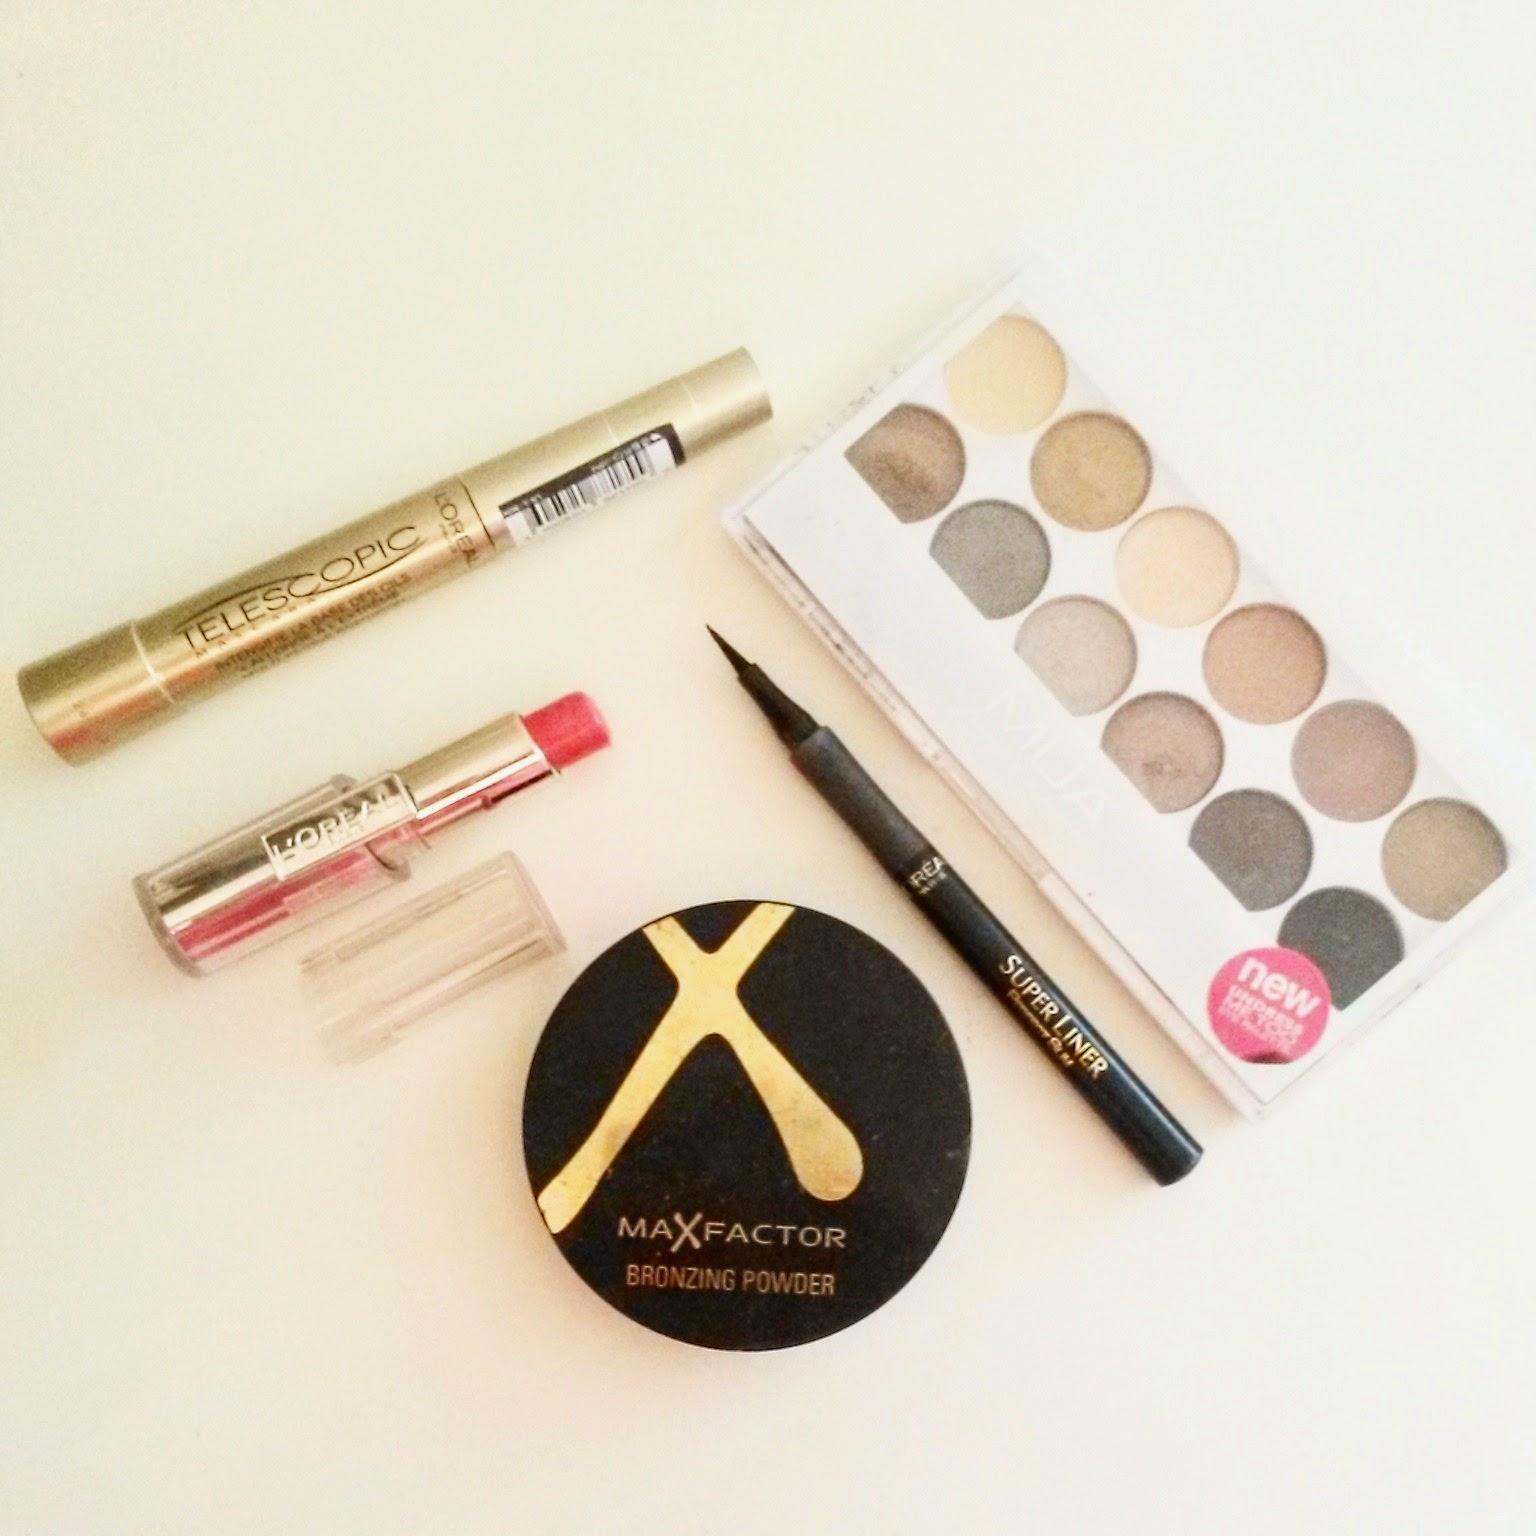 Best drugstore highstreet makeup